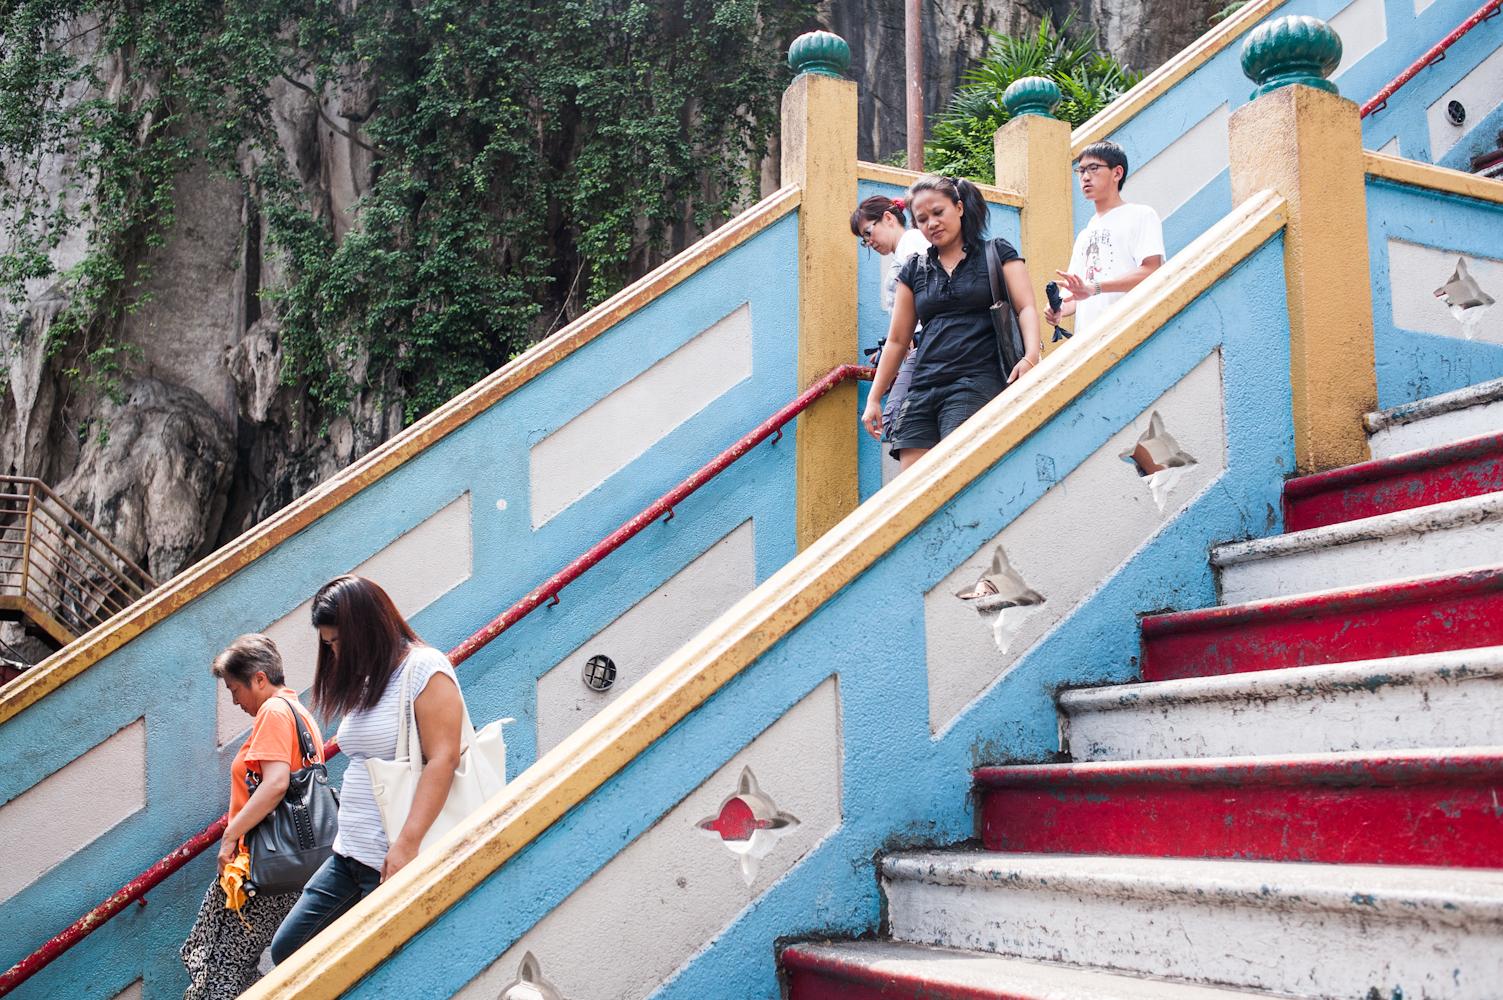 20120729_KEVINMICHAELBRIGGS_indonesia_001.jpg